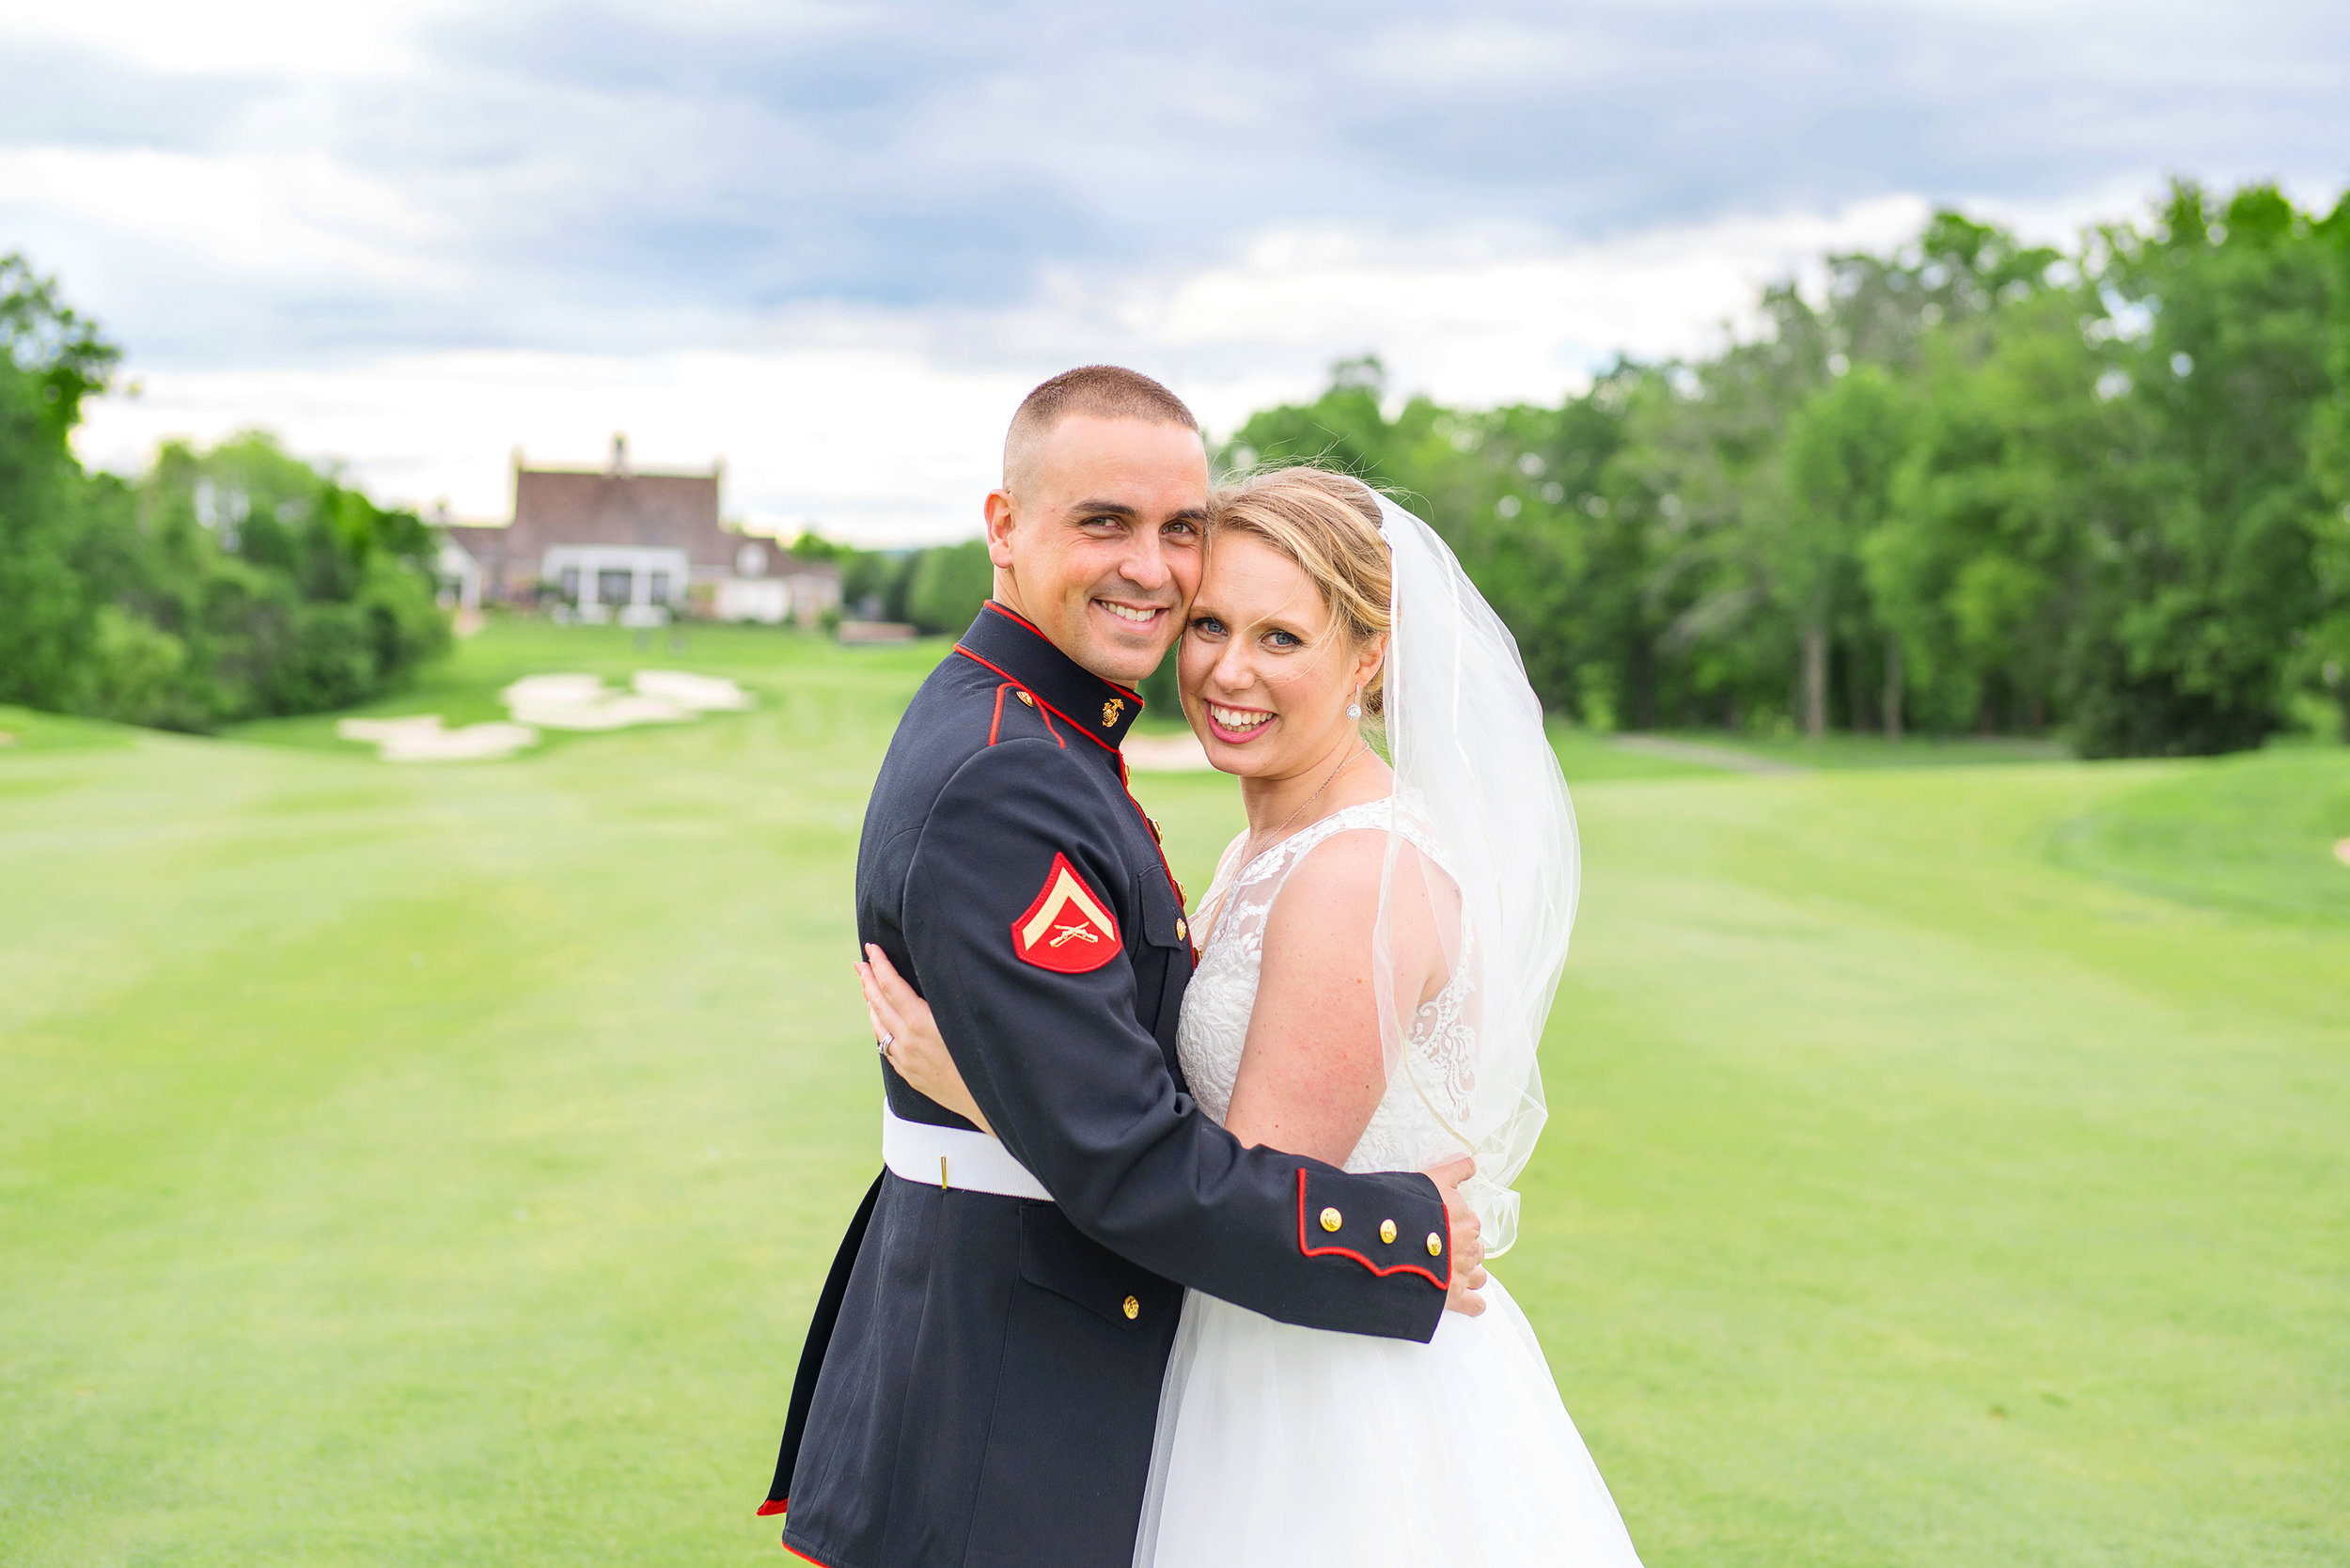 Piedmont Golf Course 18th hole wedding portraits